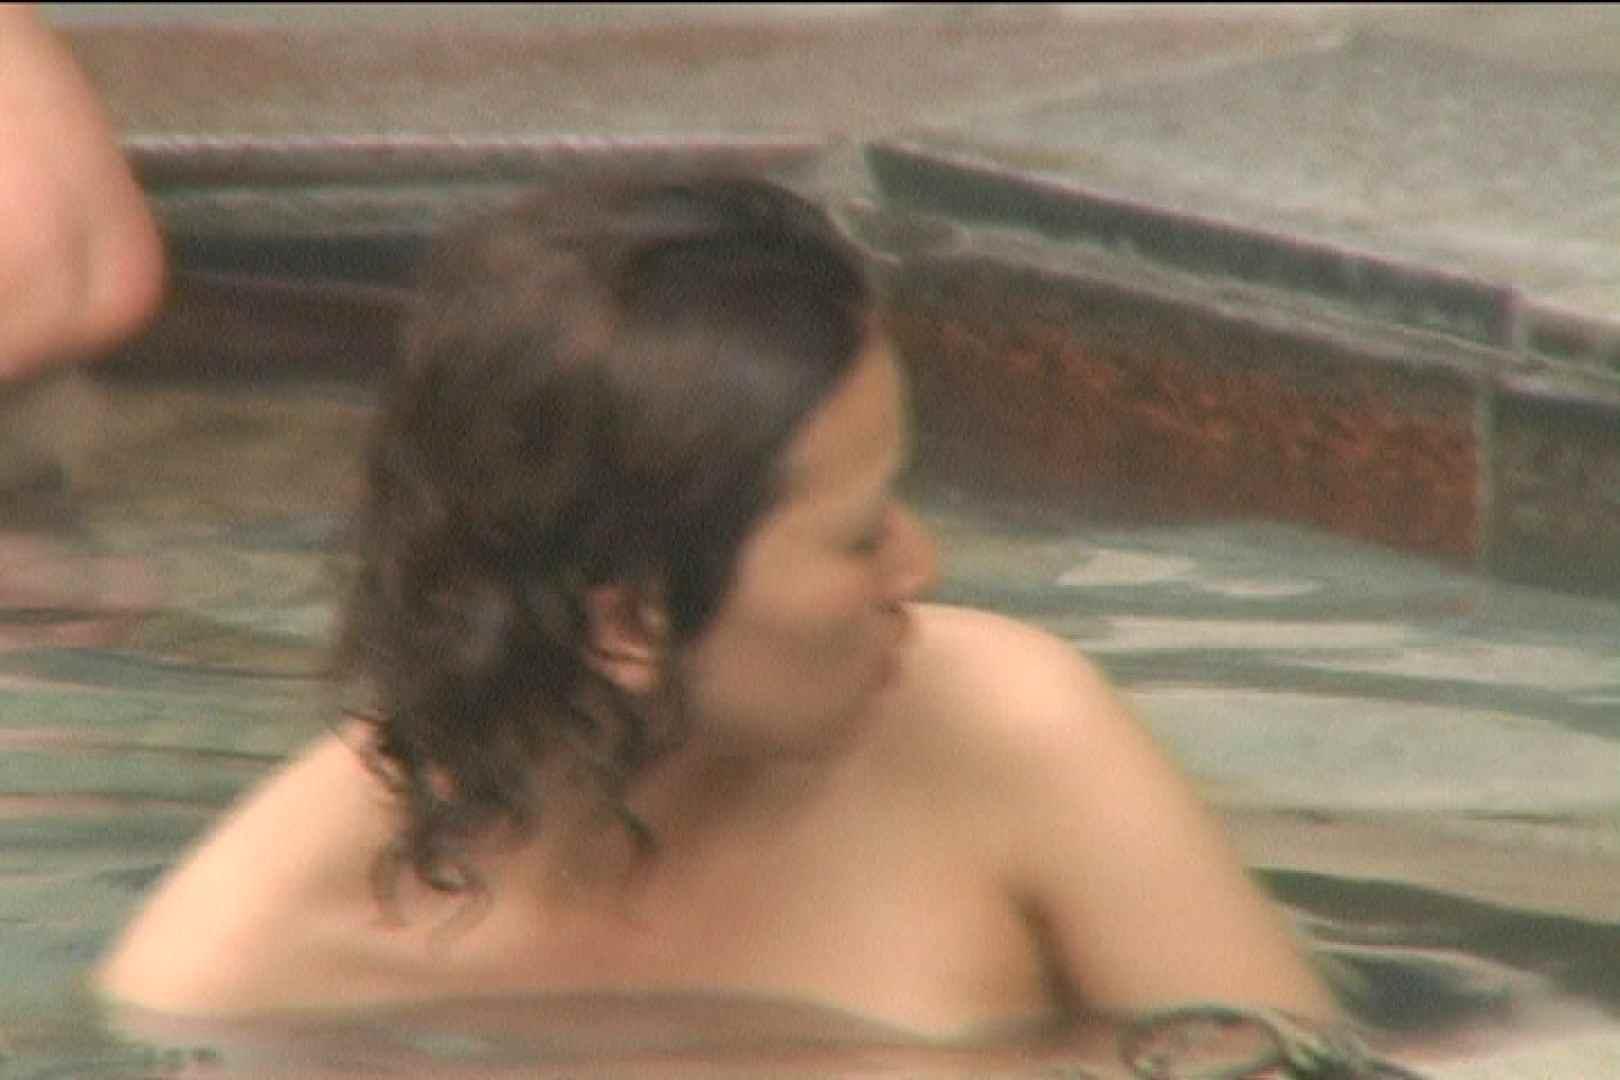 Aquaな露天風呂Vol.131 露天  82連発 42